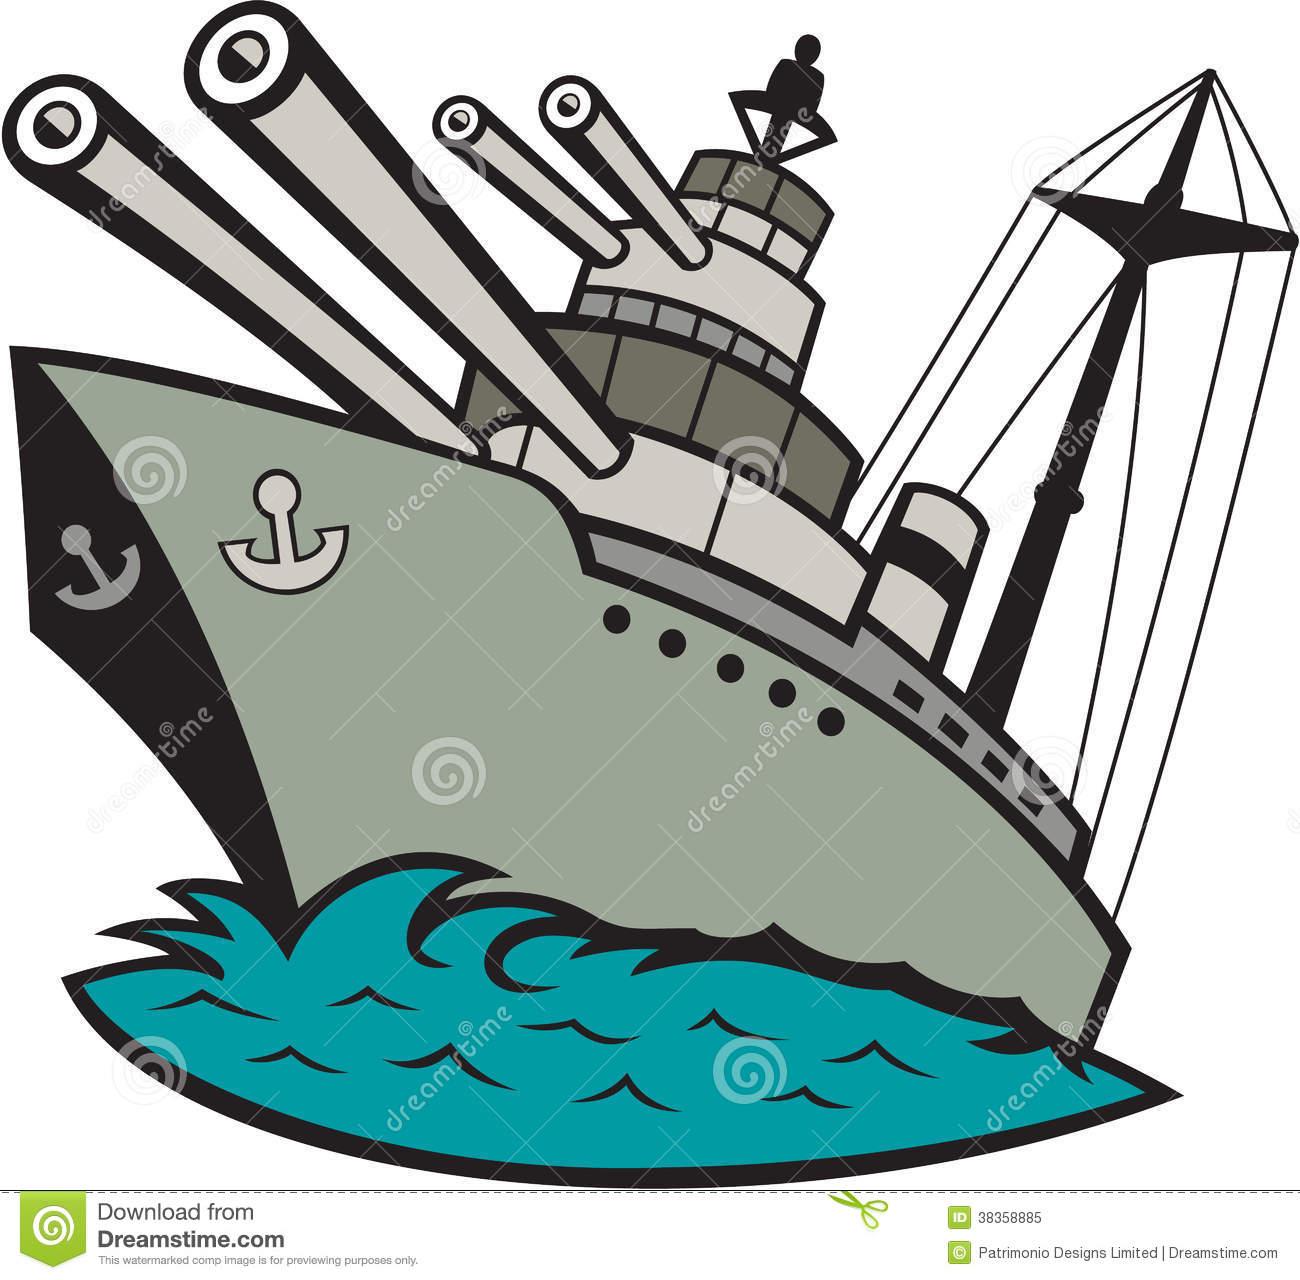 World War Two Battleship Cartoon Royalty Free Stock Photo.